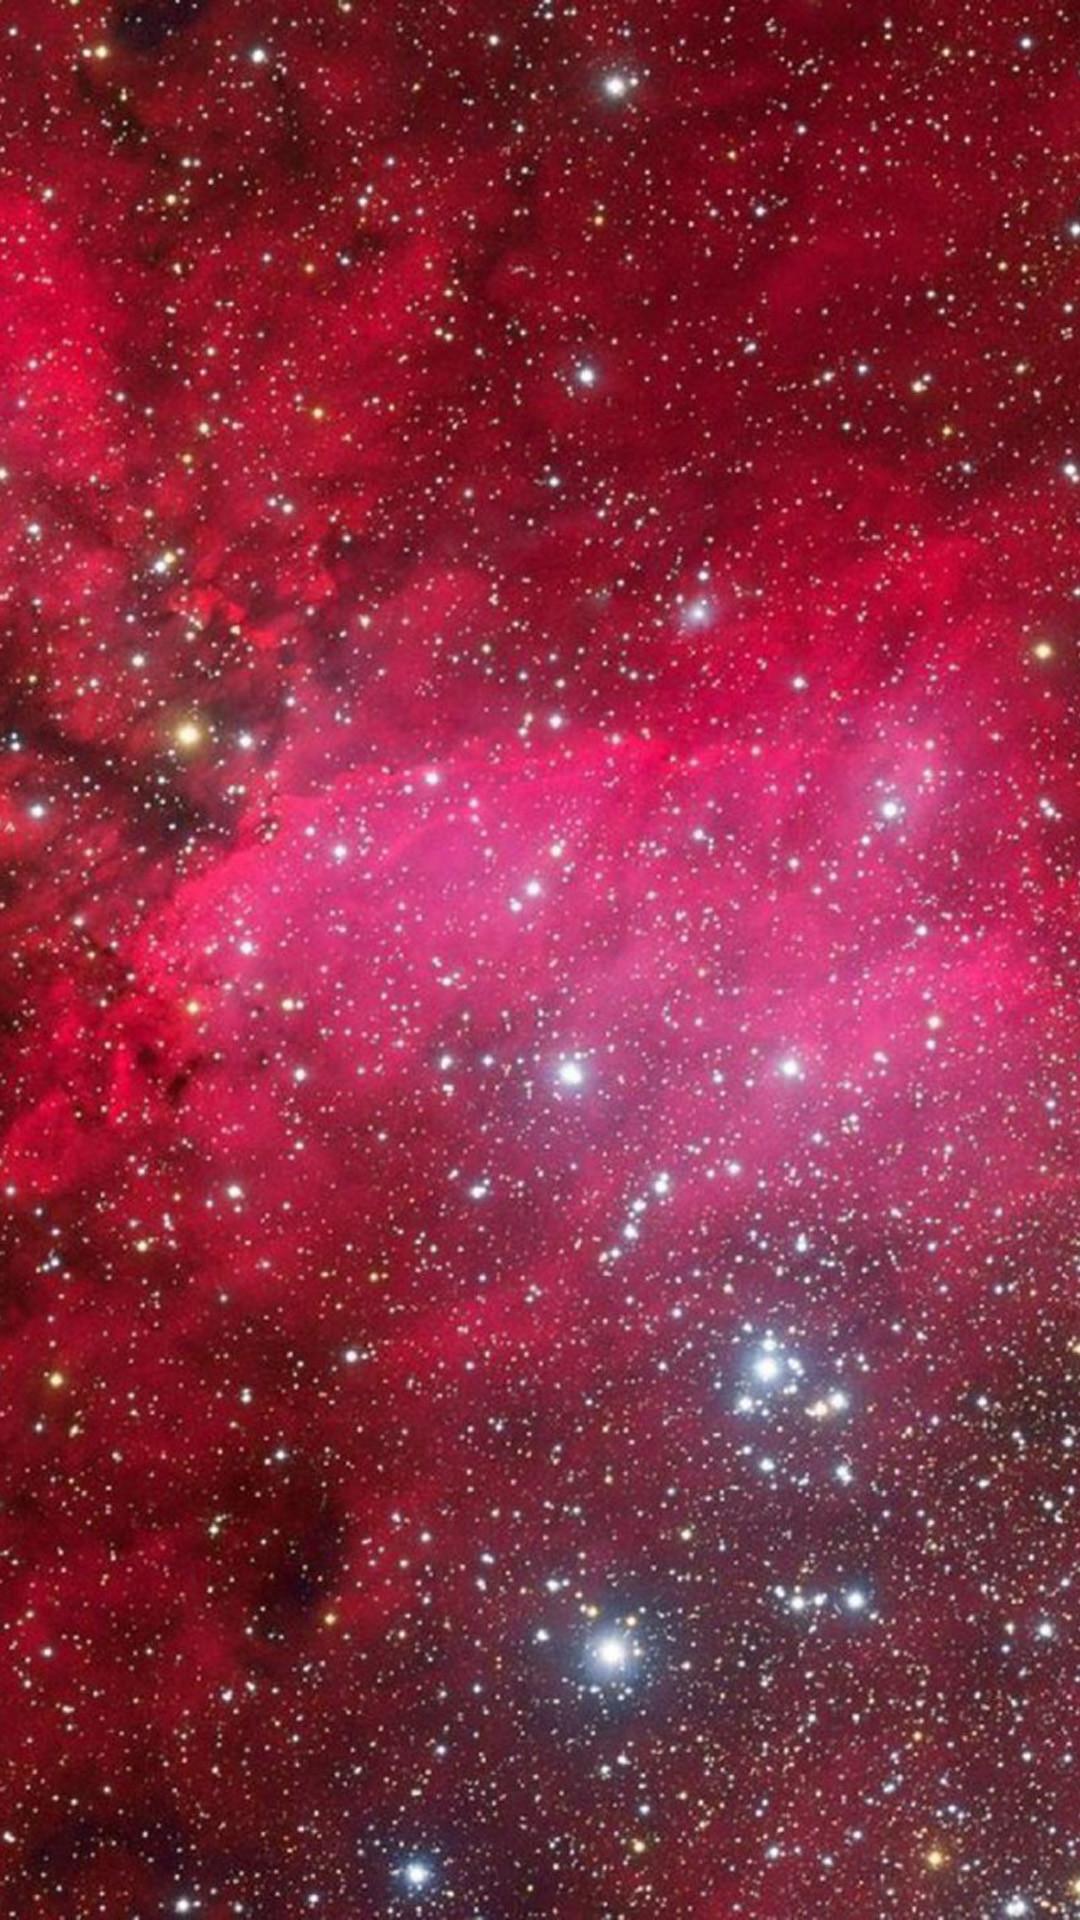 Pink Nebula iphone 6 plus Wallpaper | iPhone 6 Plus Wallpapers HD